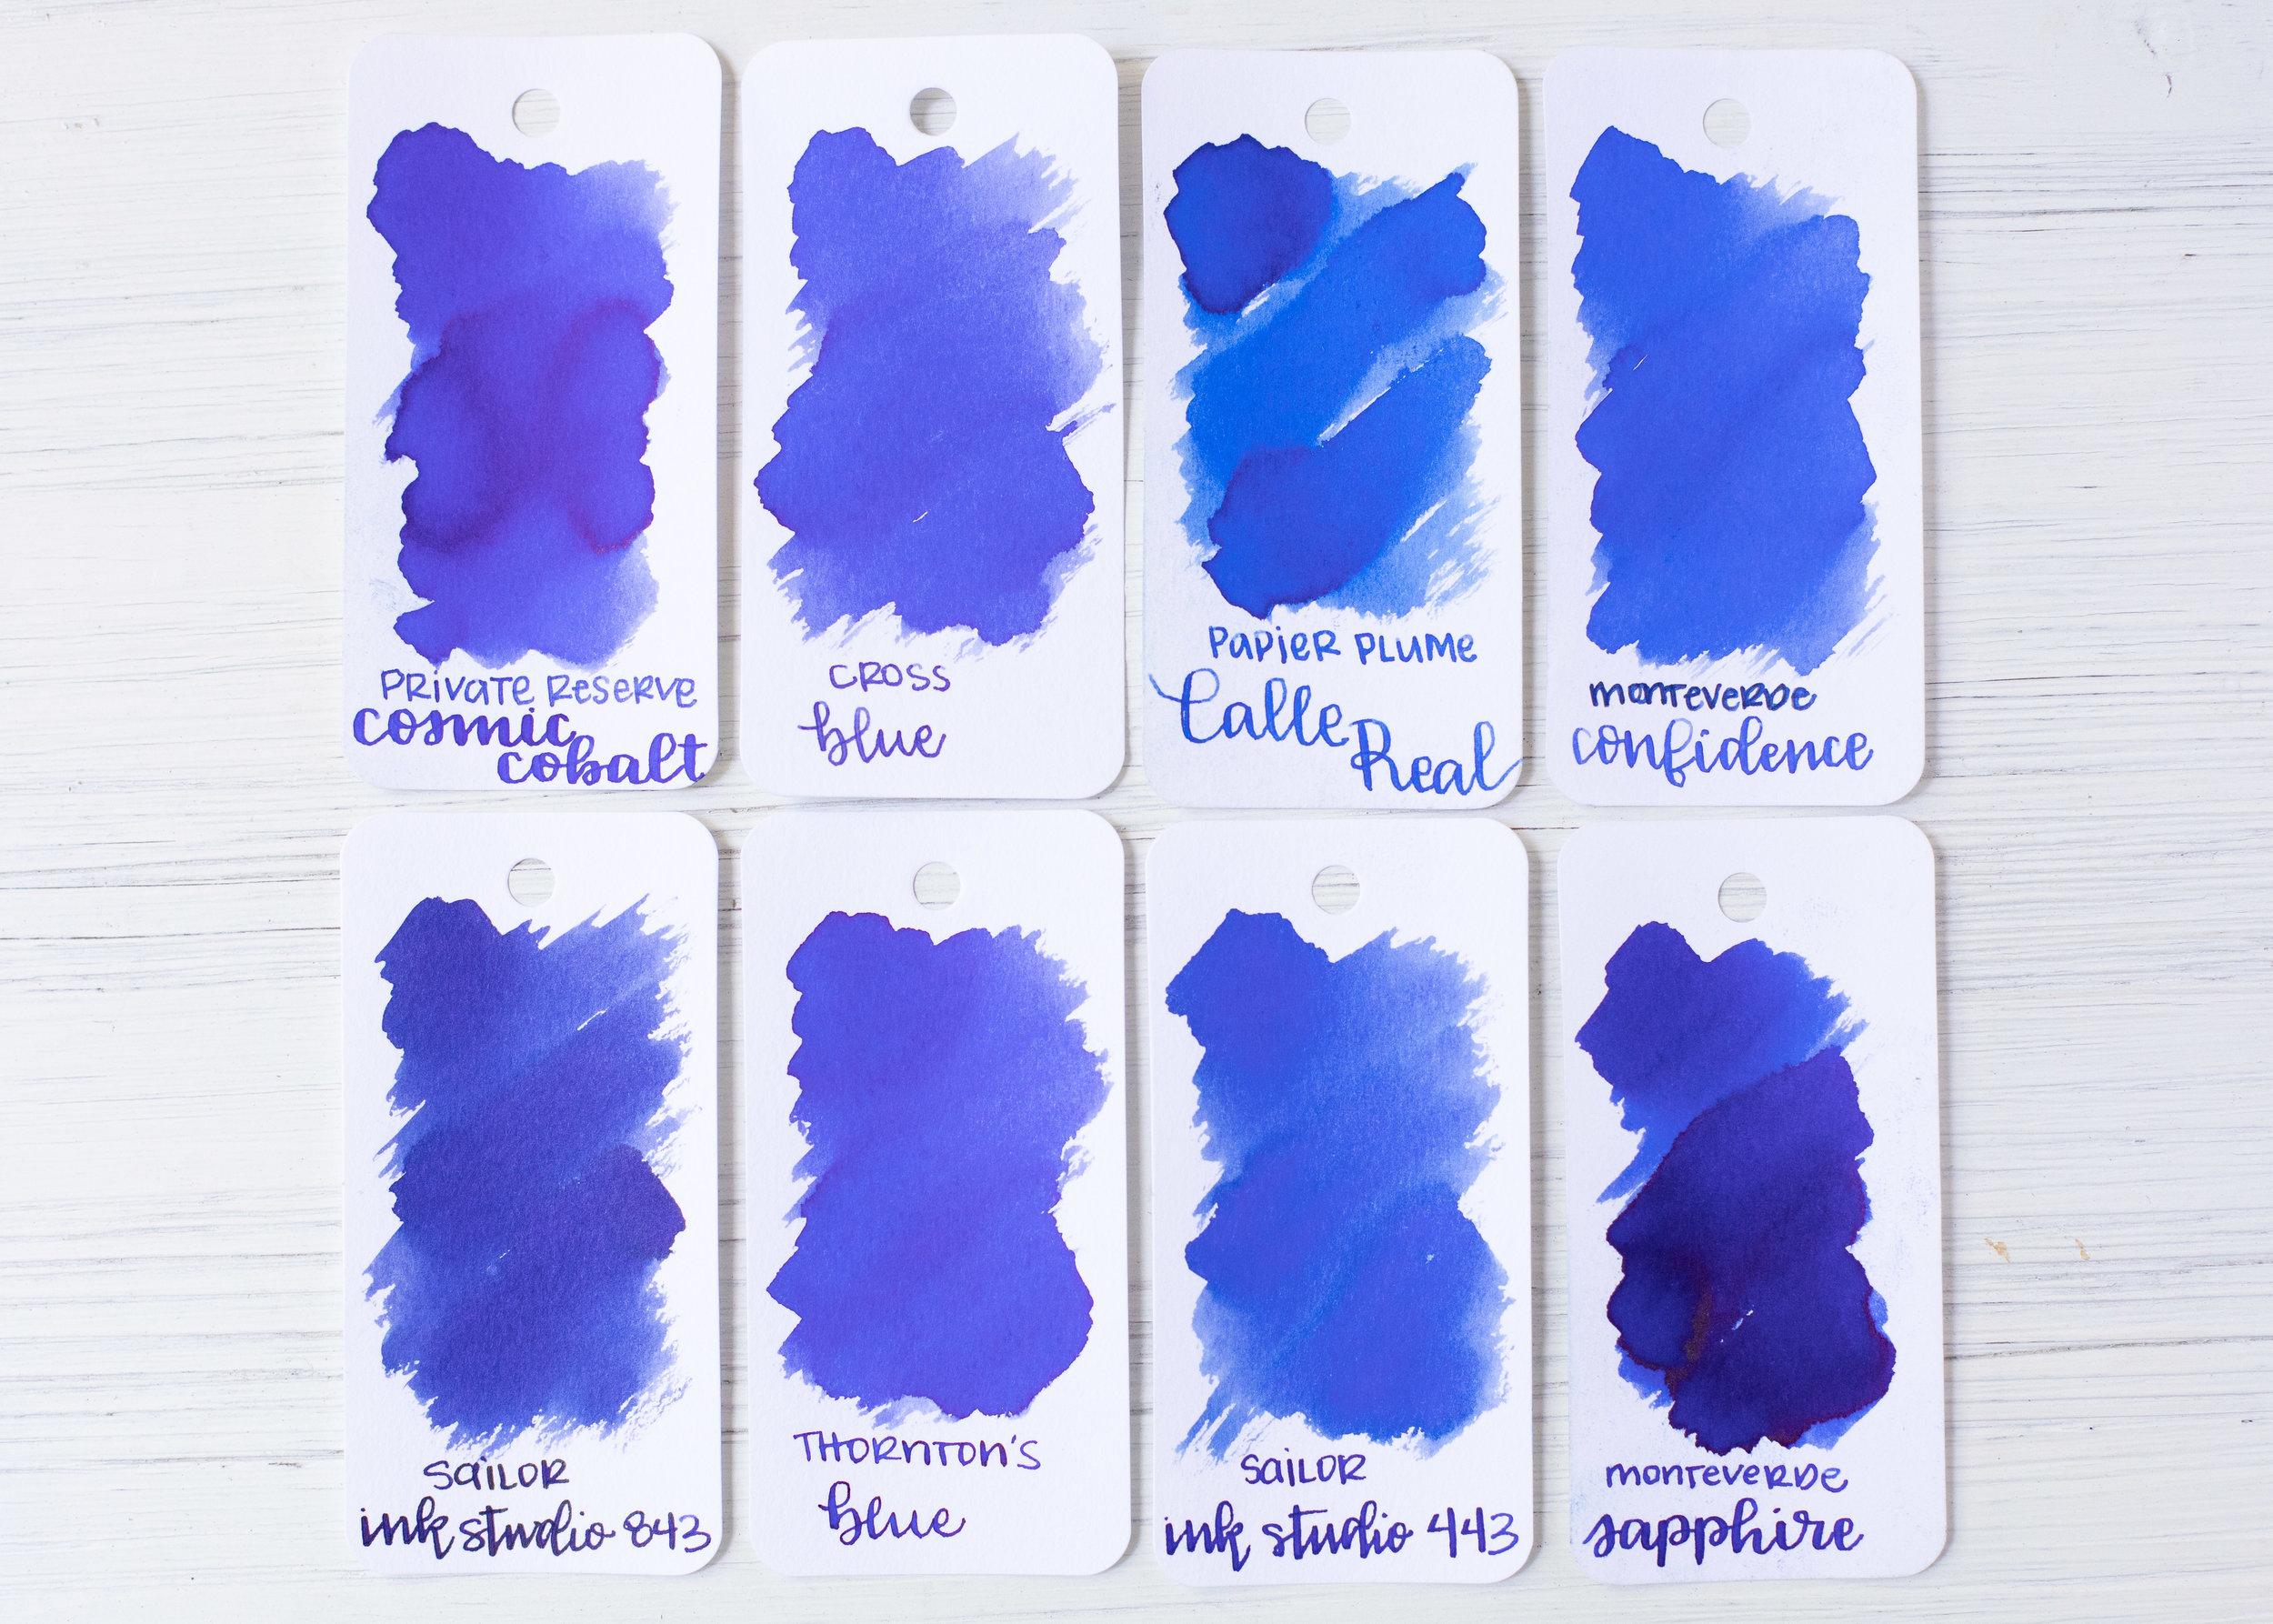 css-blue-s-1.jpg